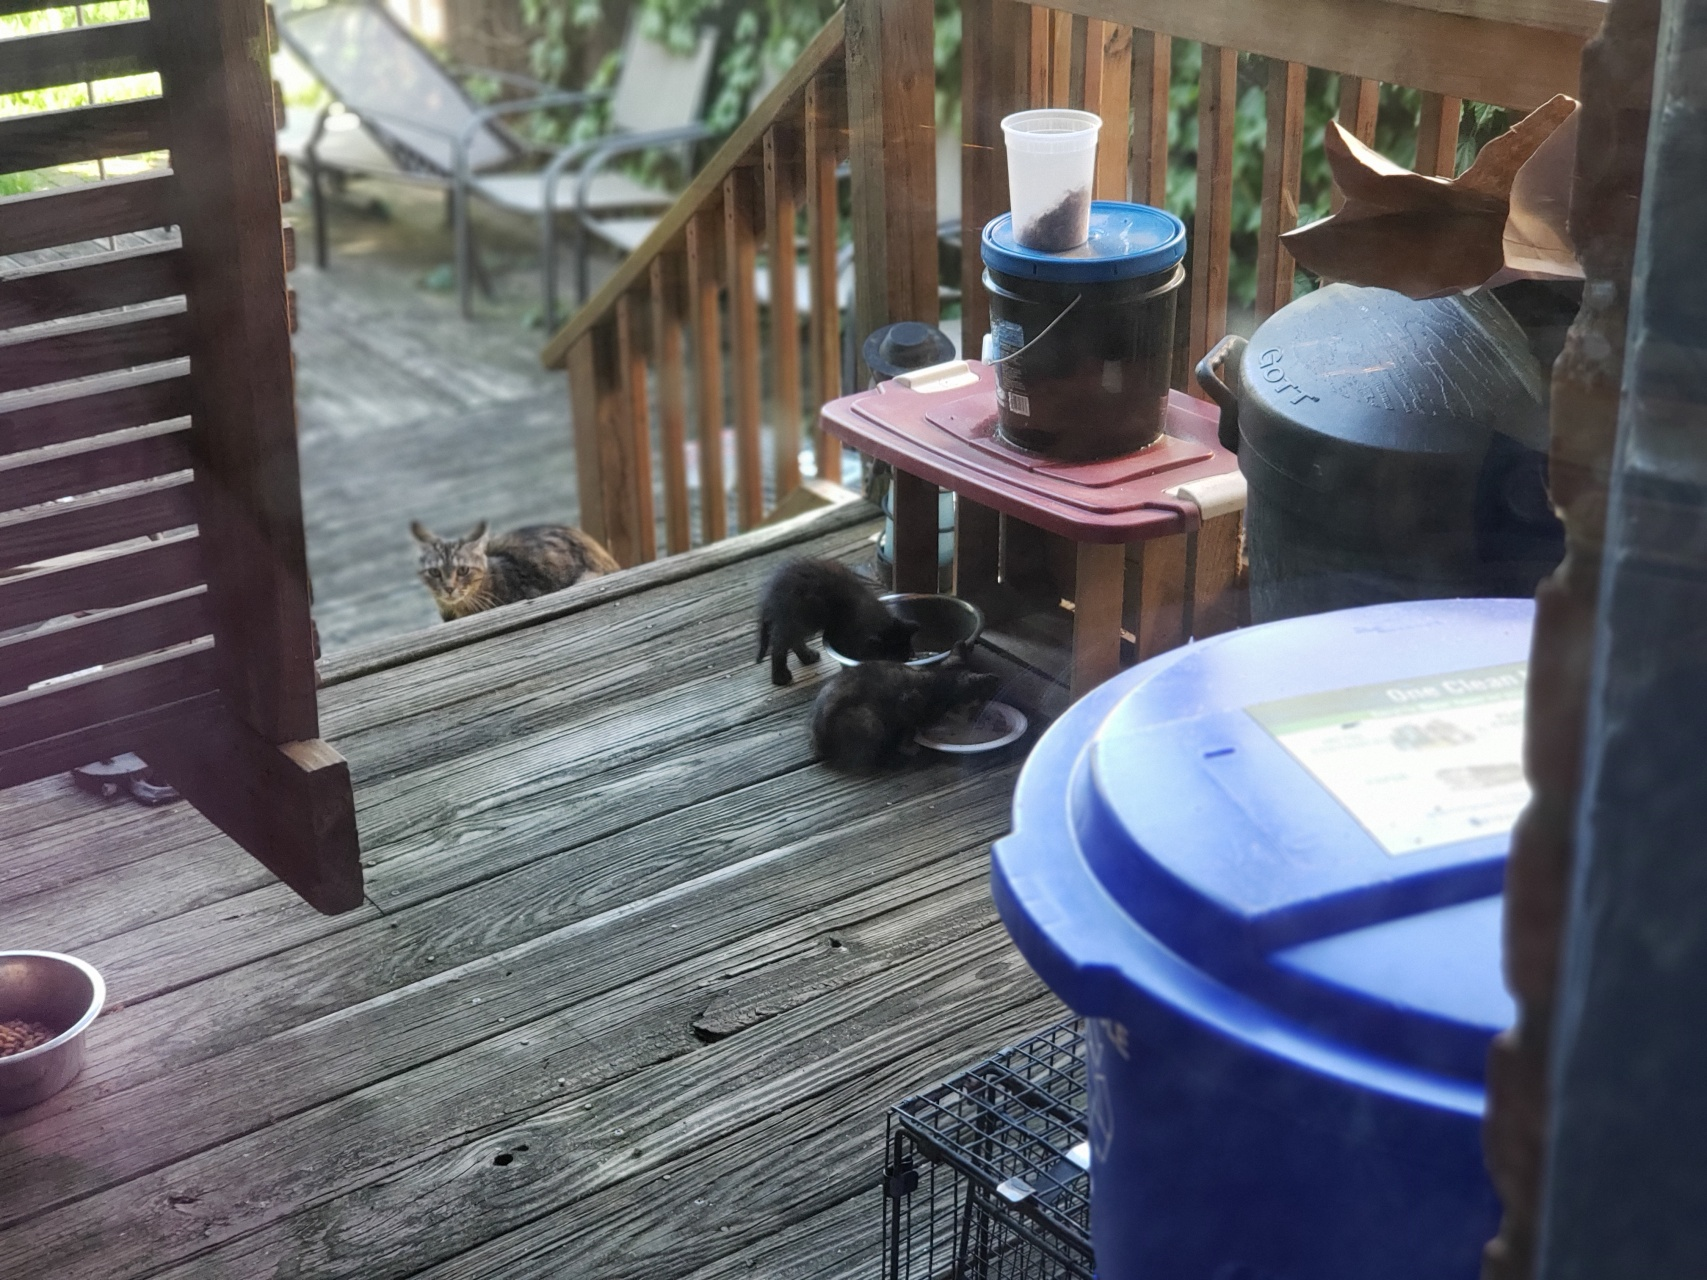 Mama cat watches kittens eat